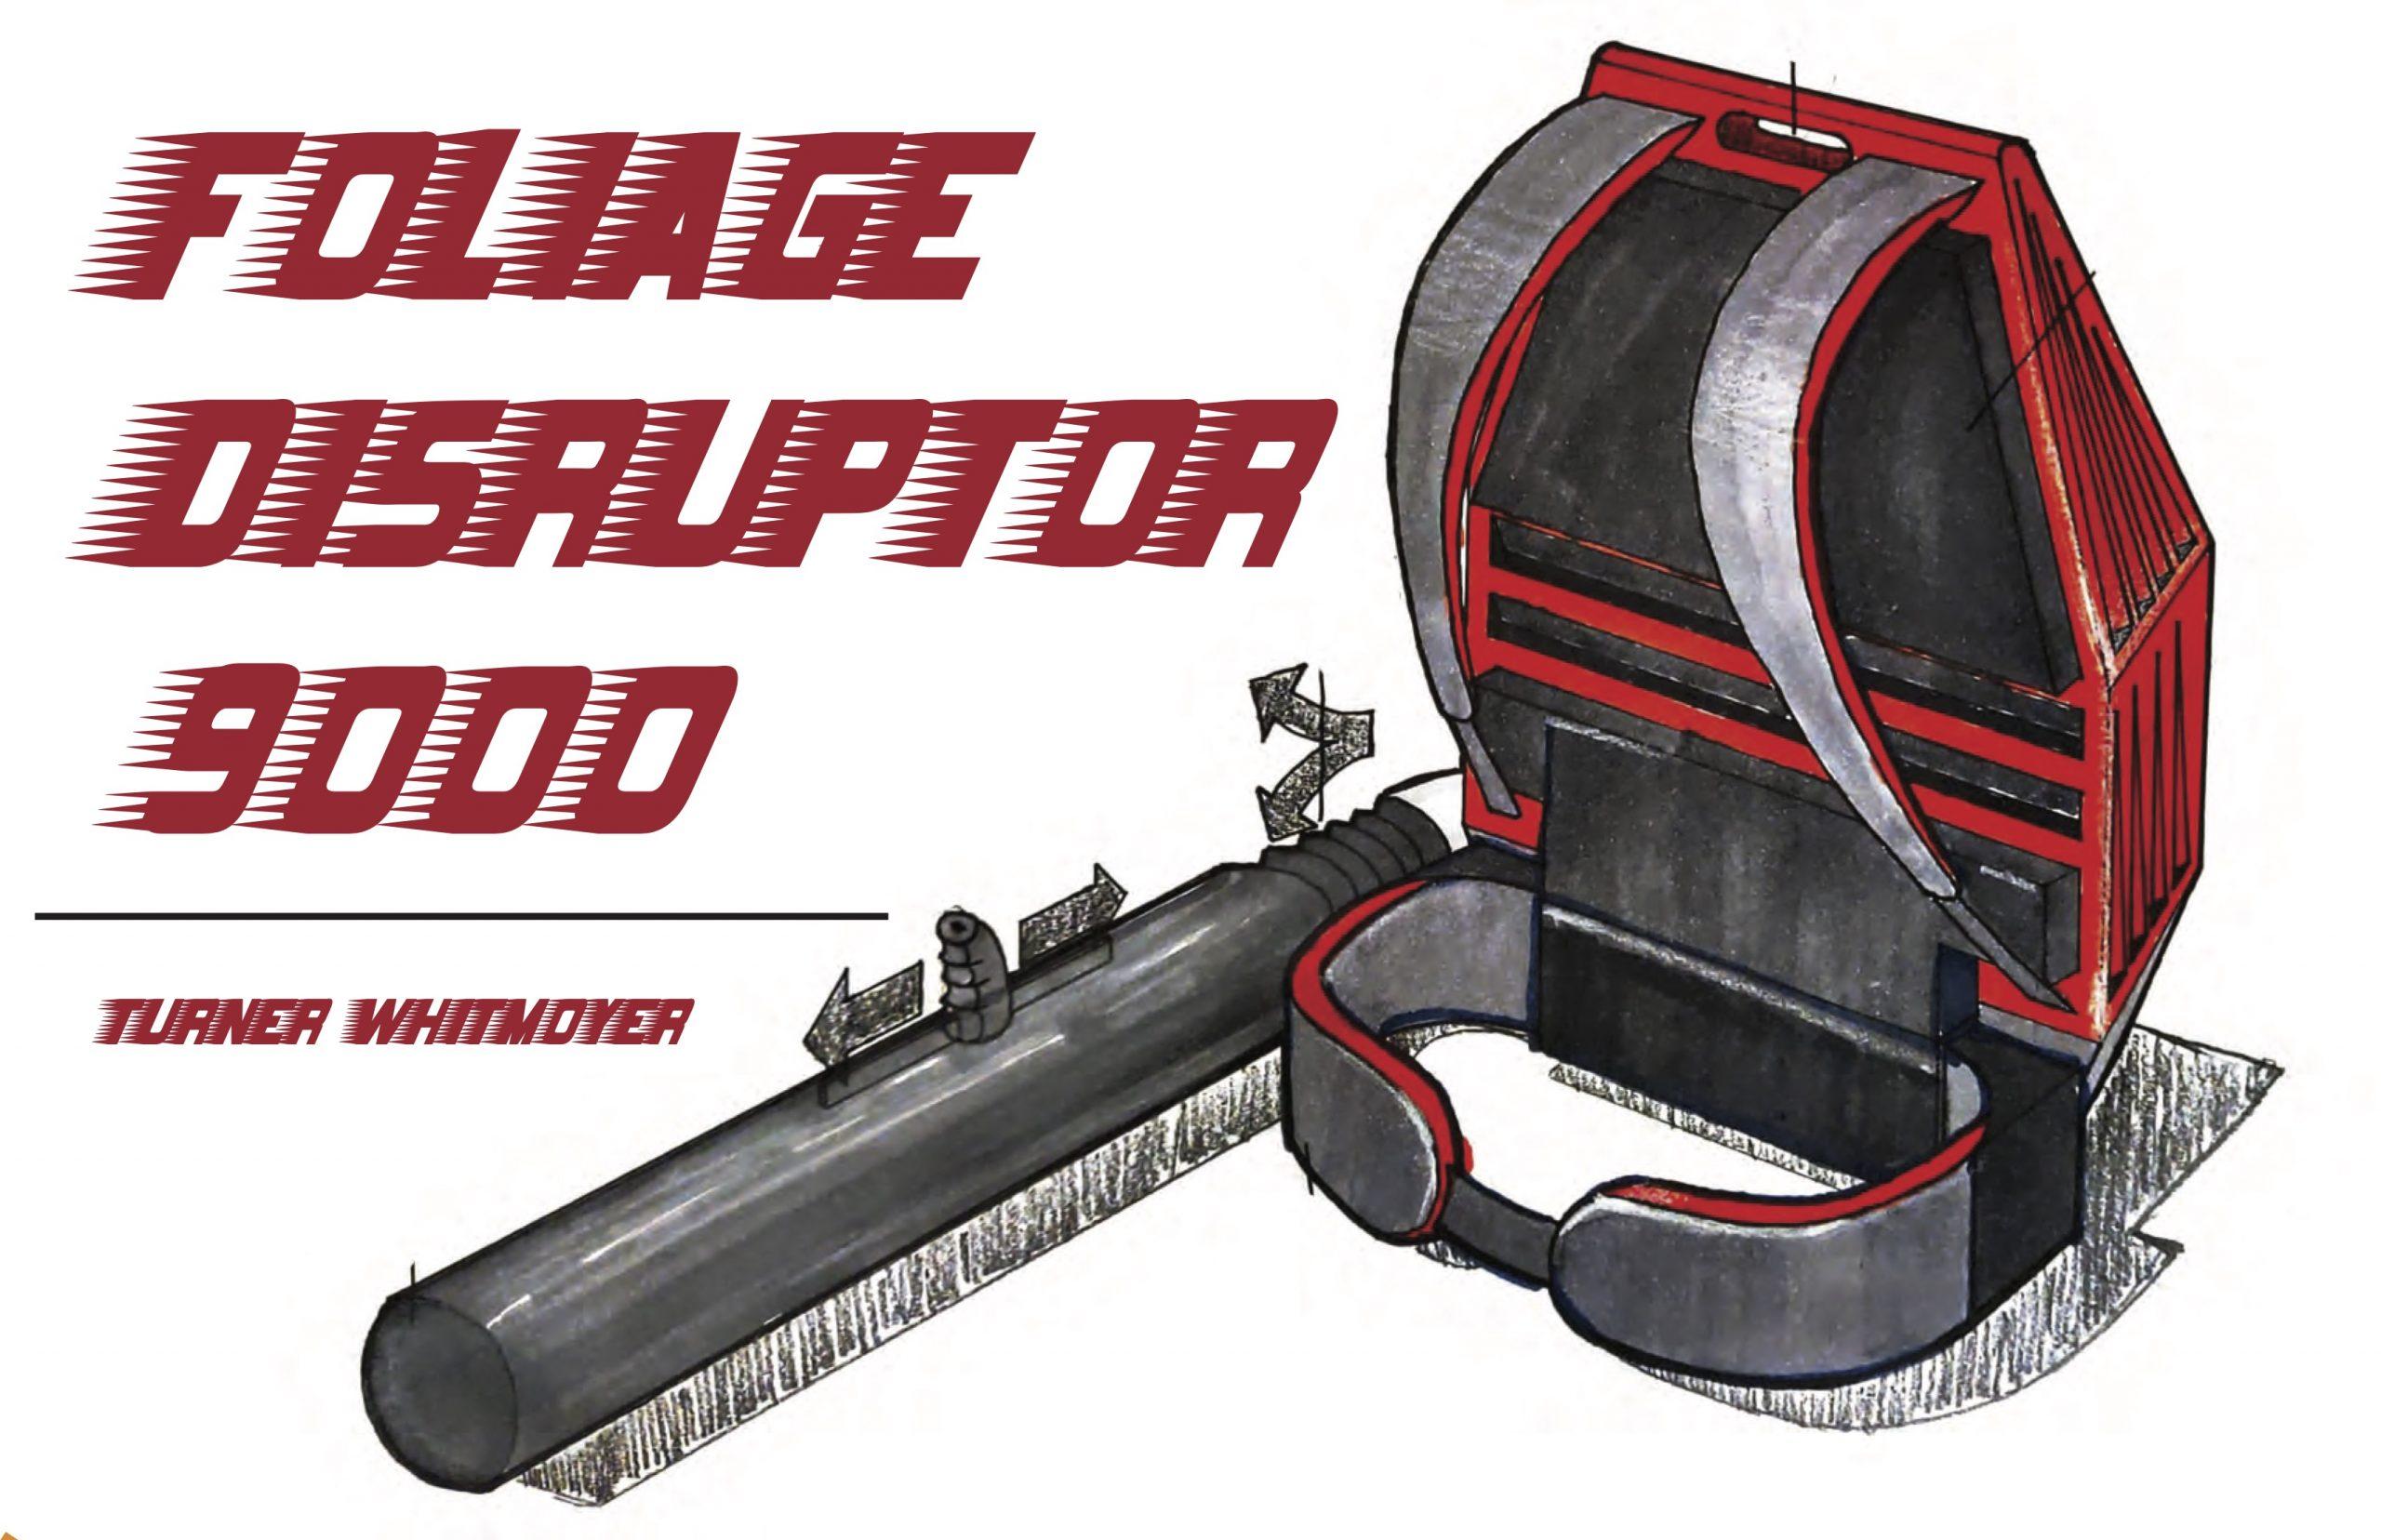 Foliage Disruptor 9000 | Turner